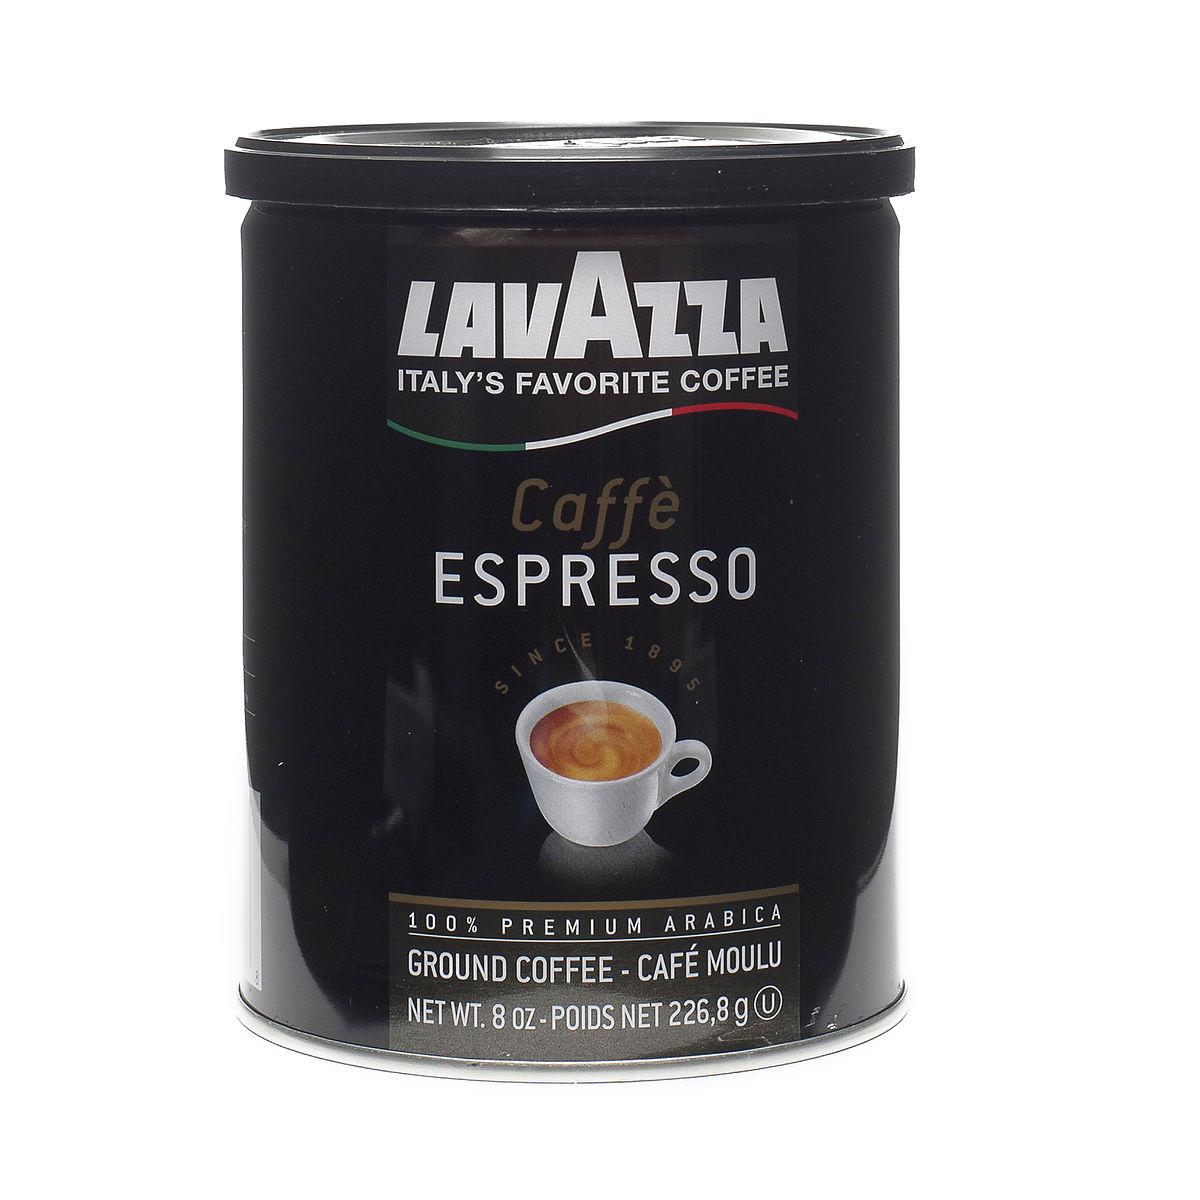 8 oz Caffè Espresso Ground Coffee by Lavazza - Thrive Market